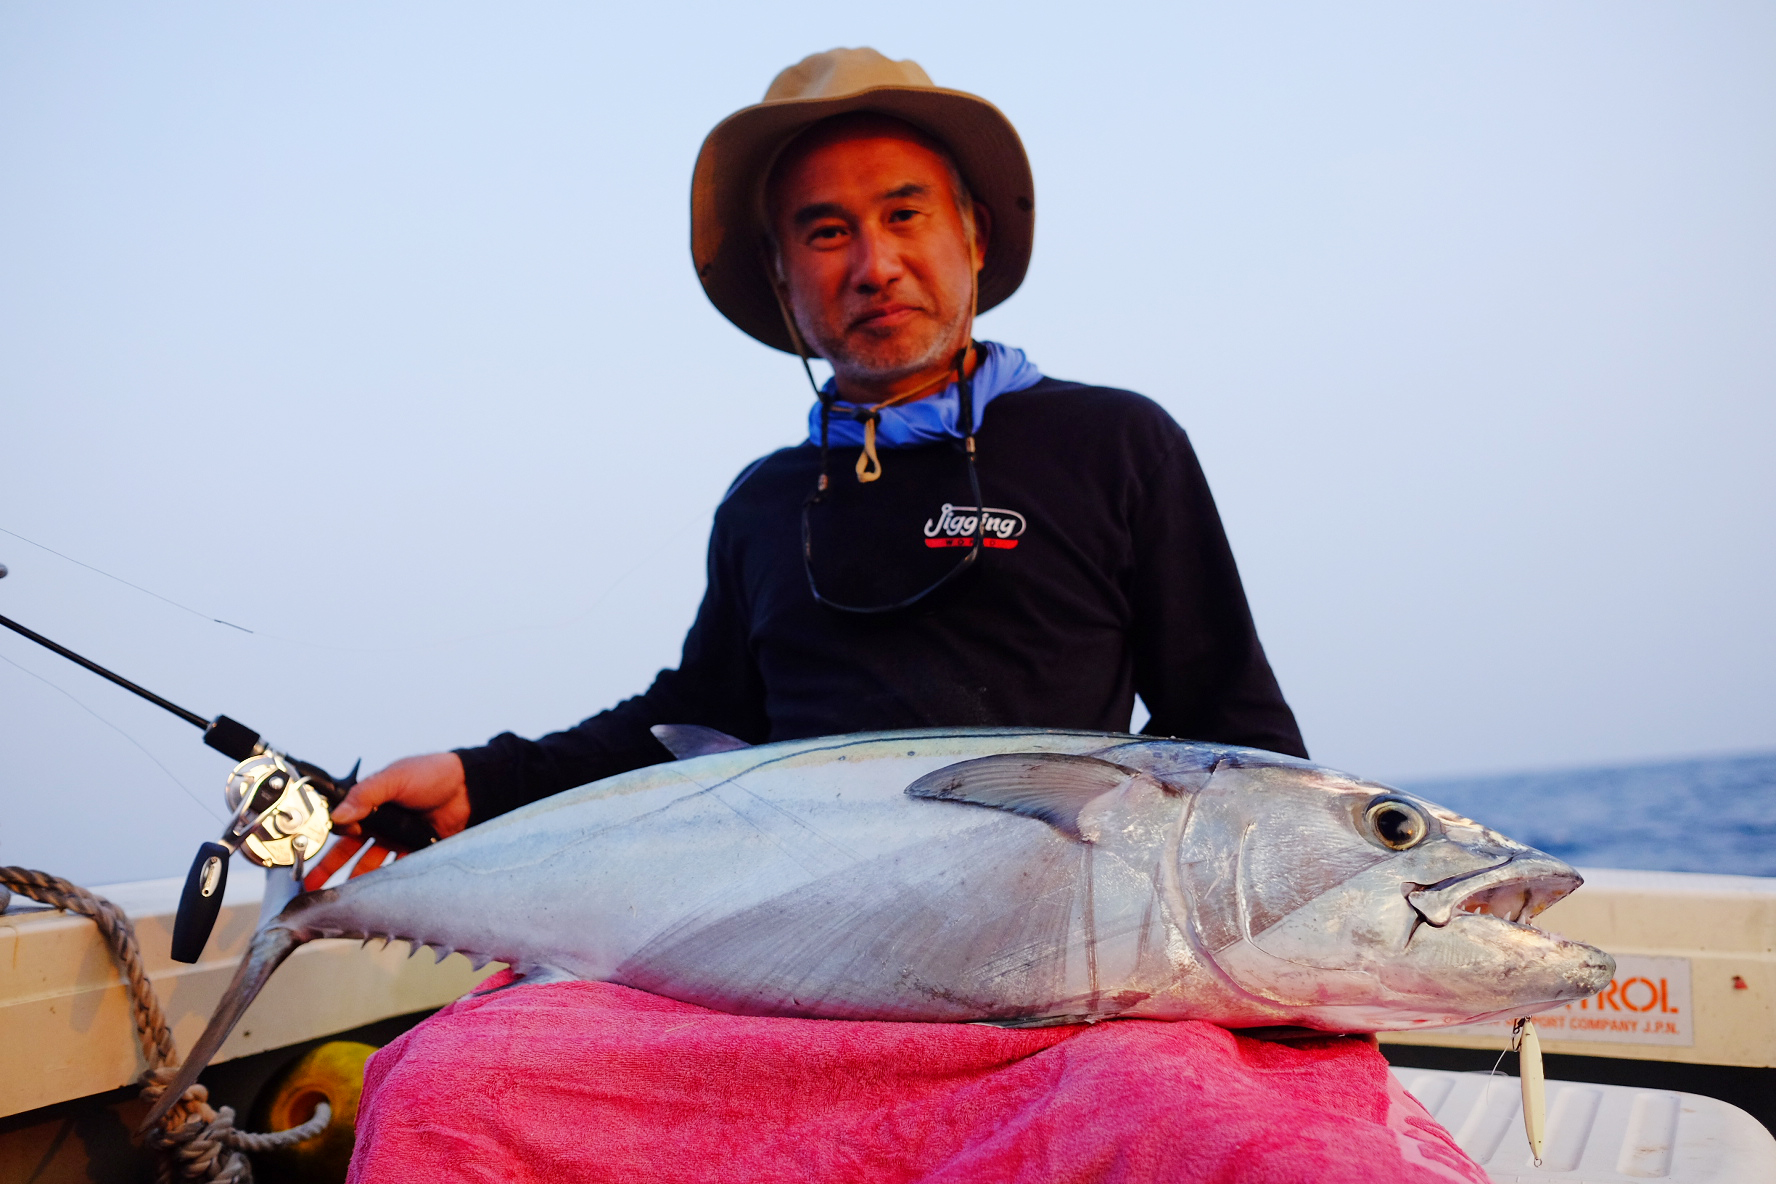 Laws okinawa spearfishing Okinawa spearfishing